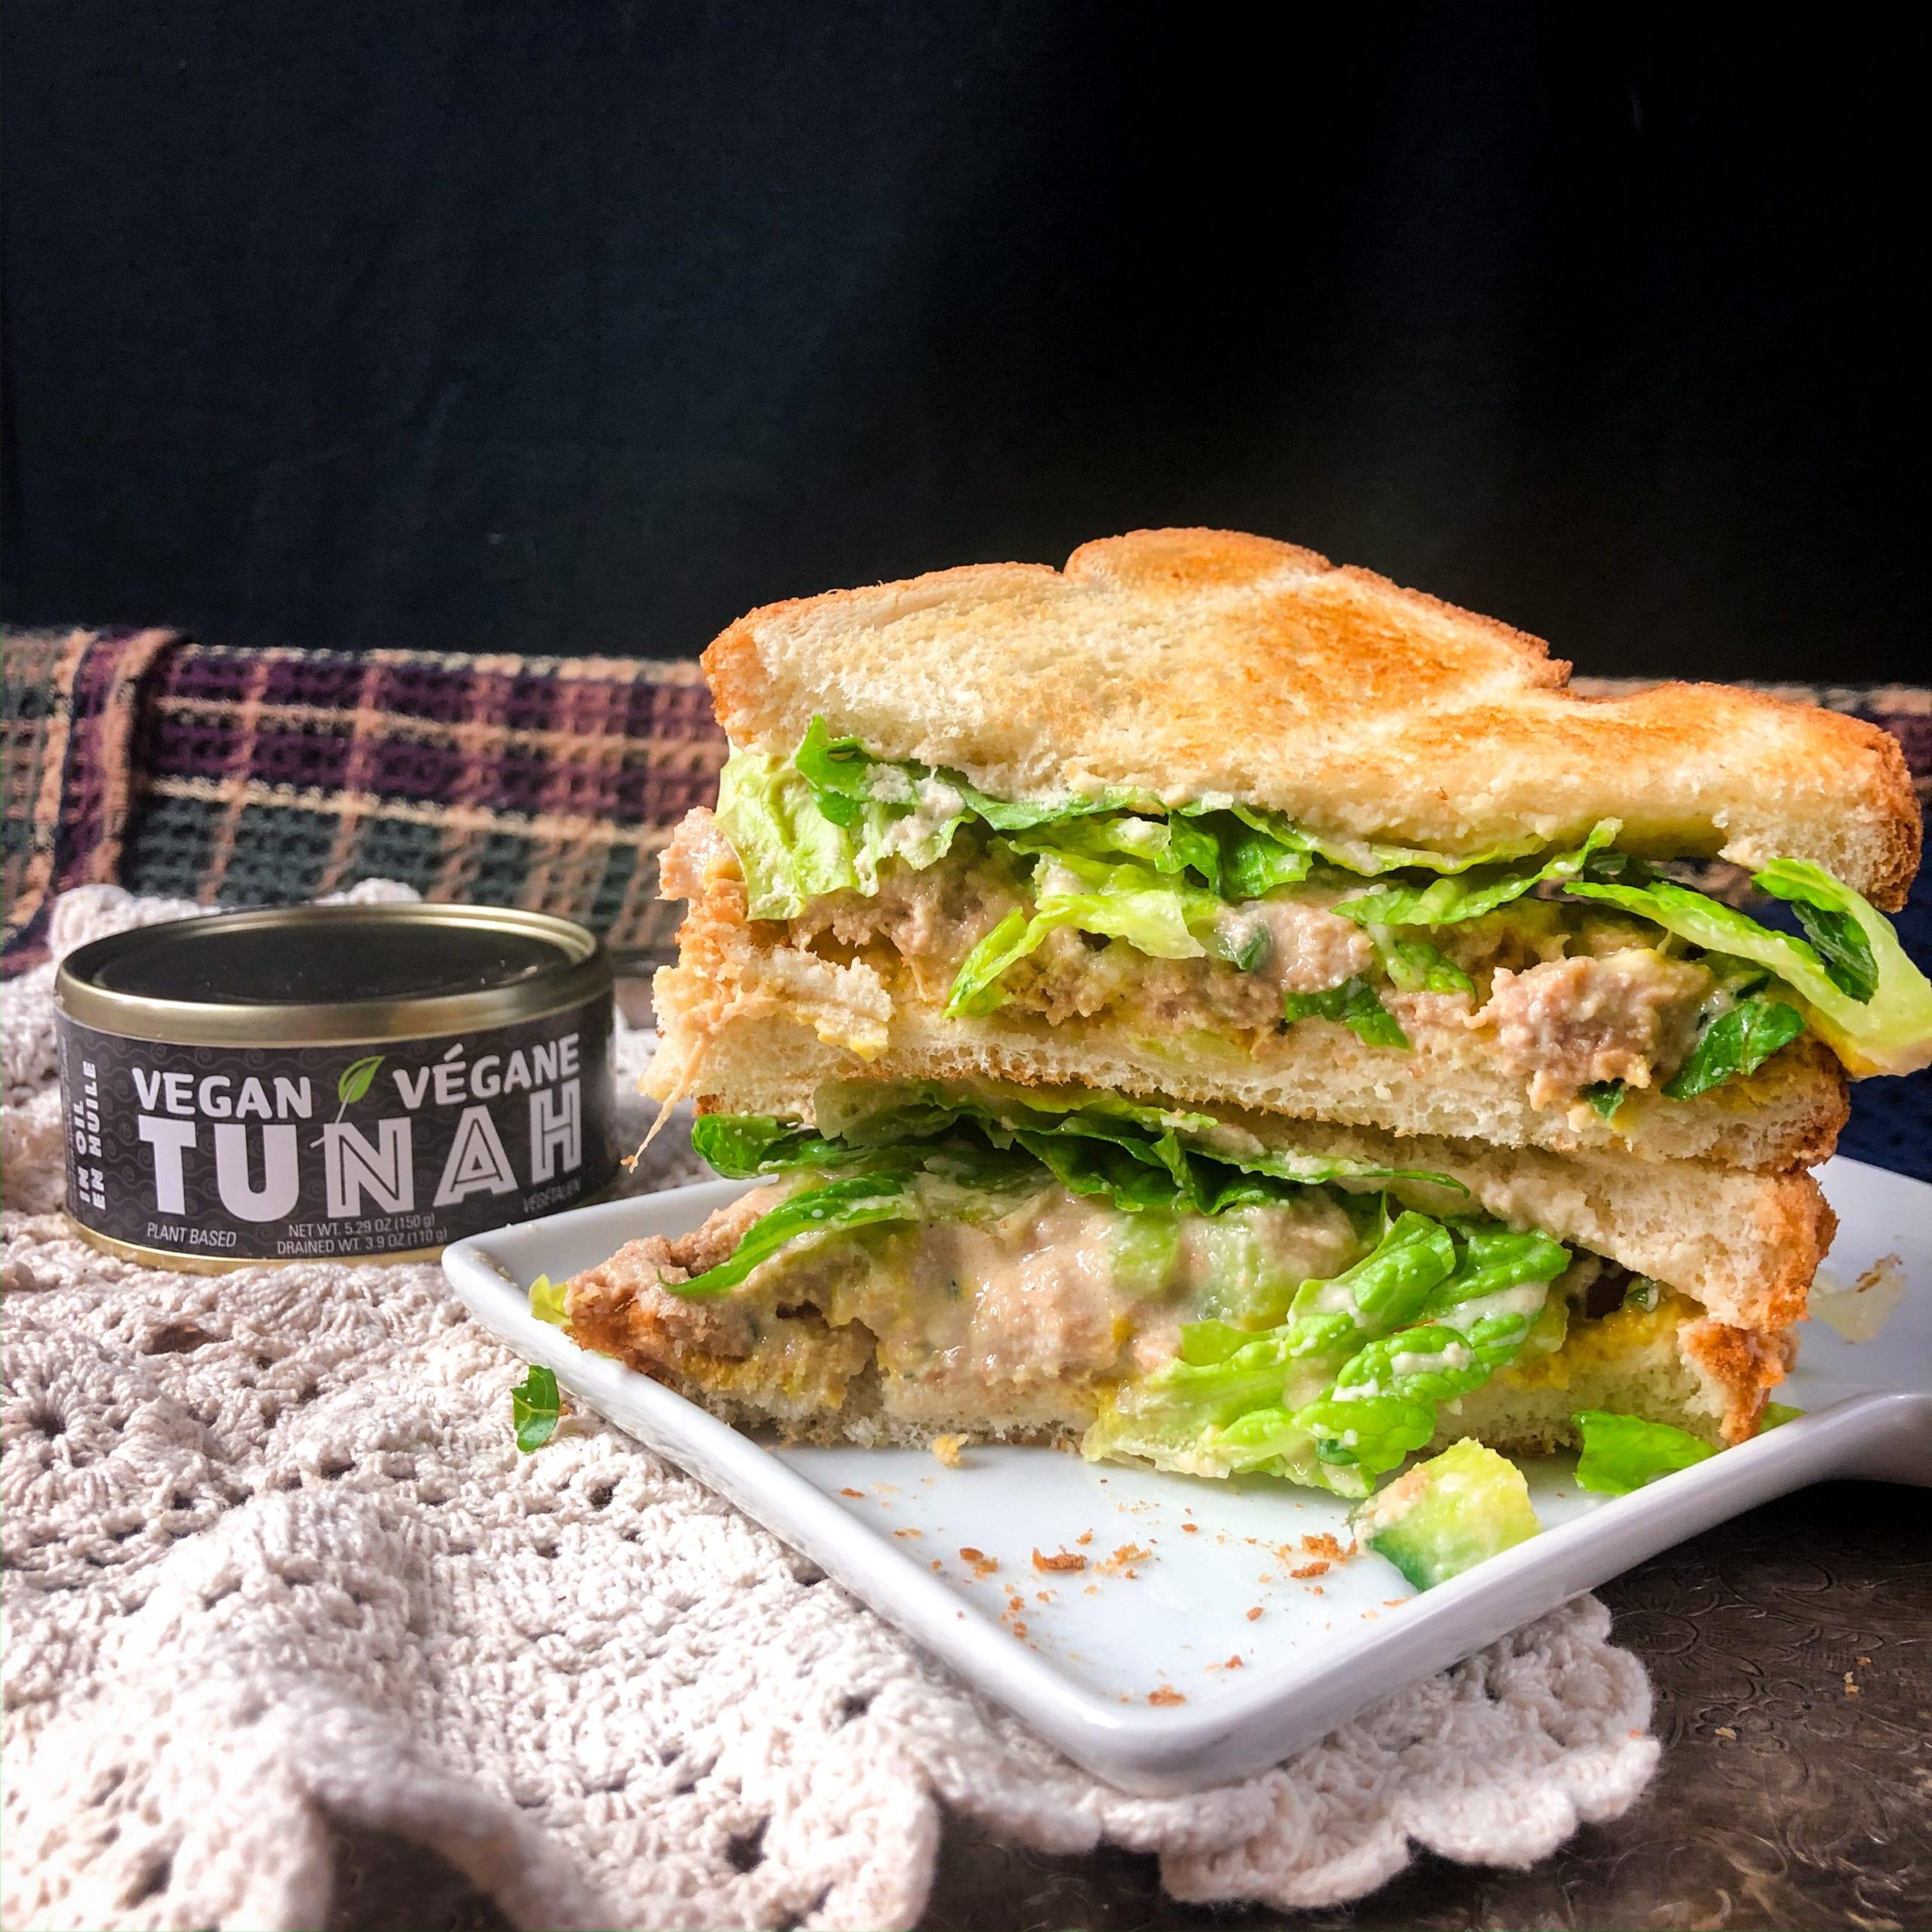 tuna salad sandwich made with vegan tuna